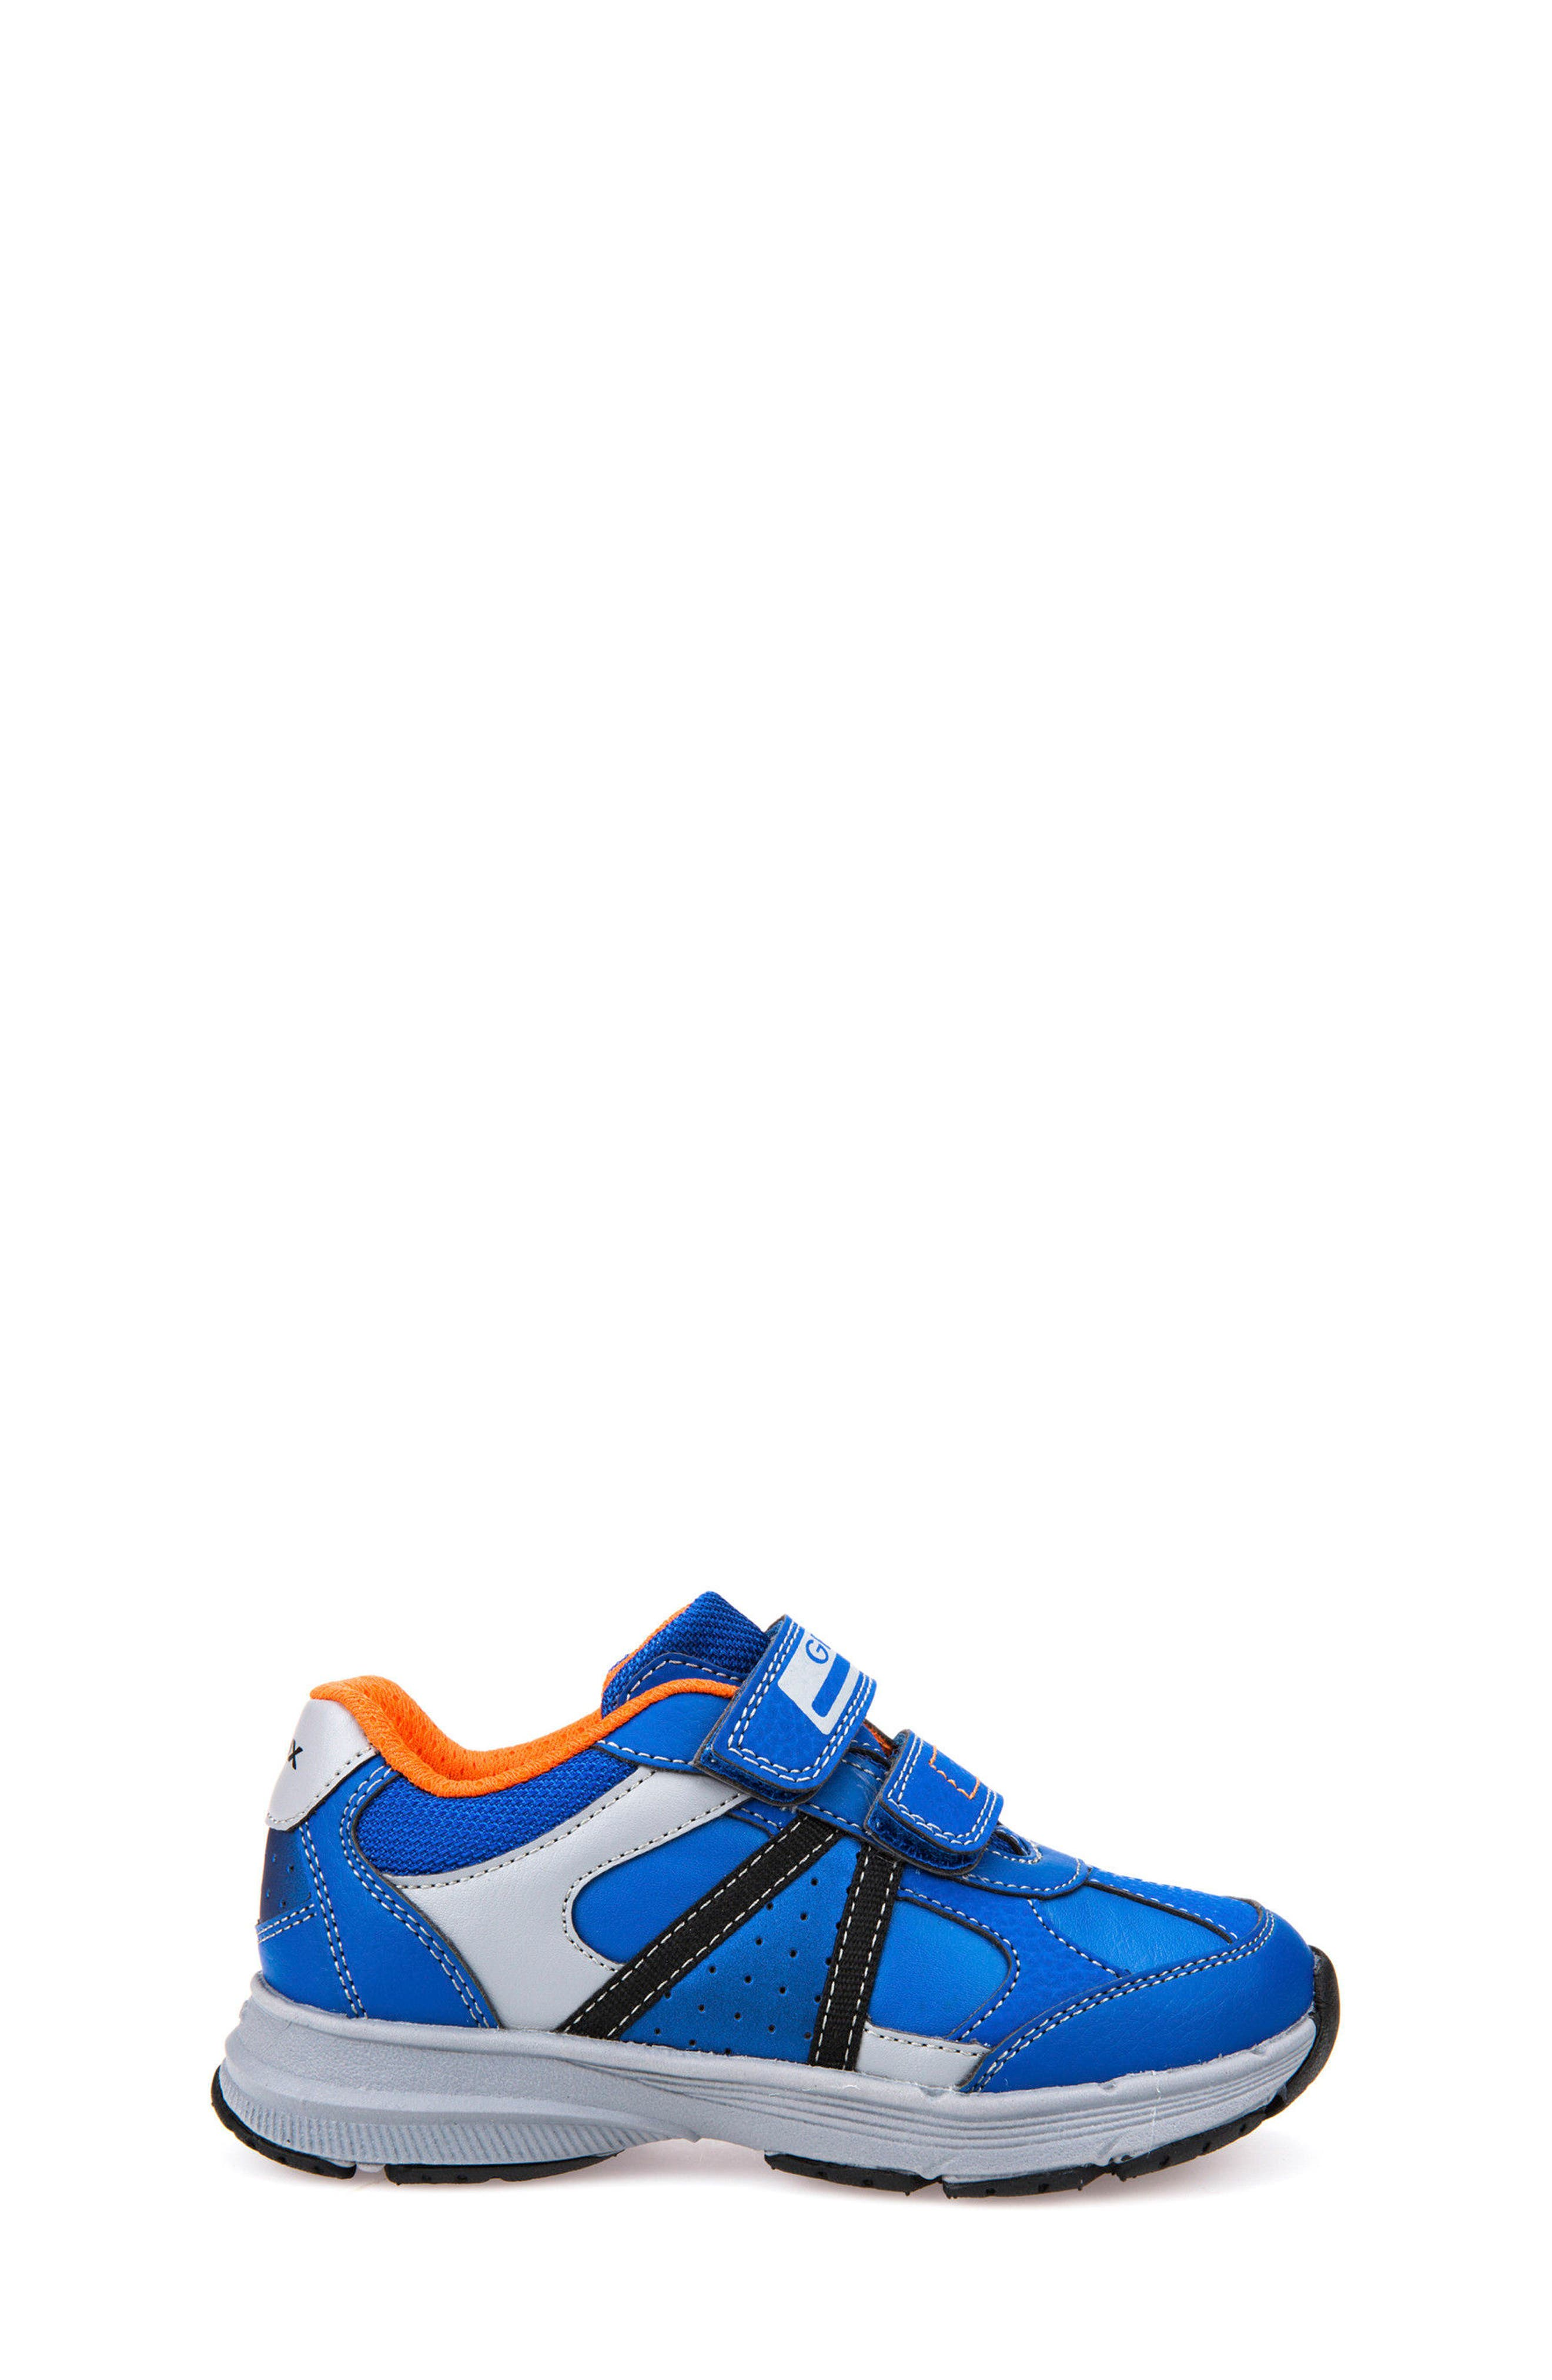 Top Fly Sneaker,                             Alternate thumbnail 9, color,